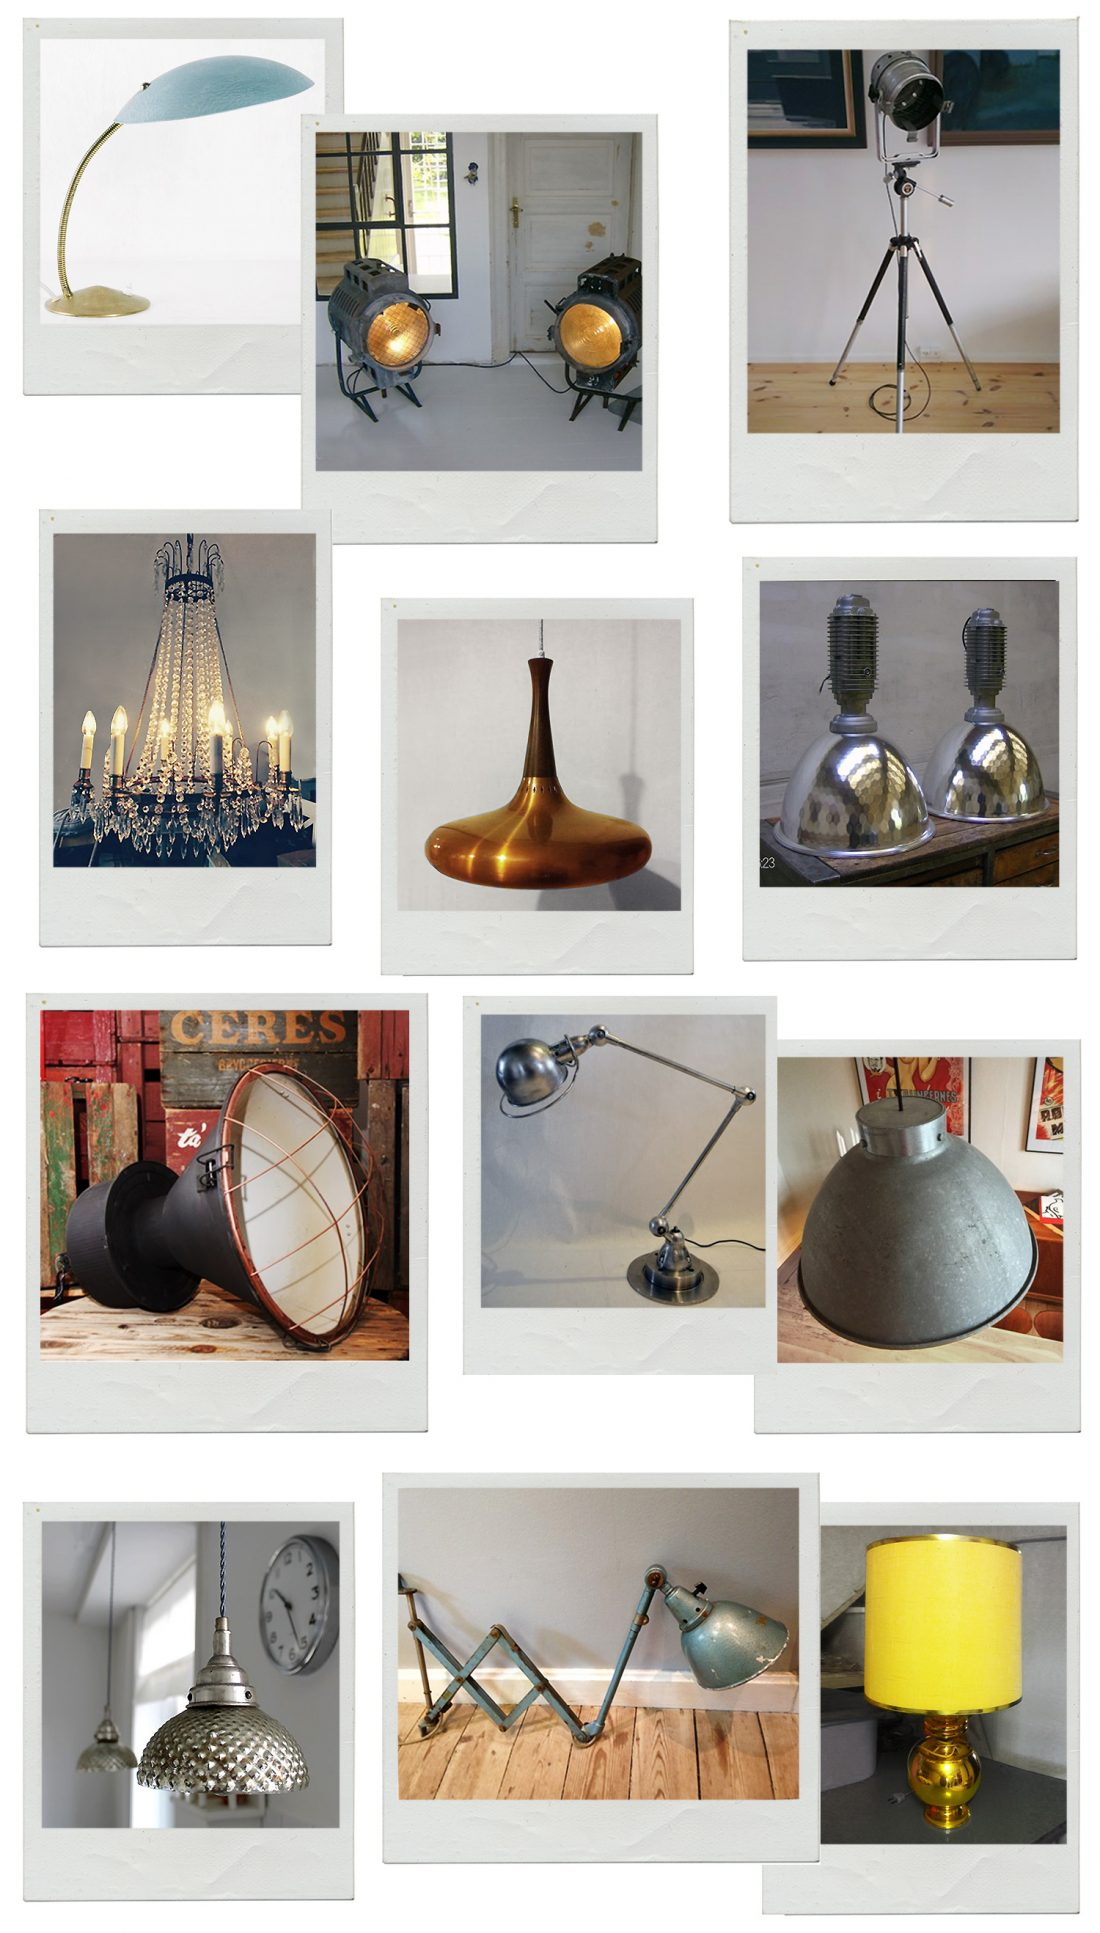 vintage-lamper-industrilampe-industrial-fabrikslampe-projektør@2x.jpg